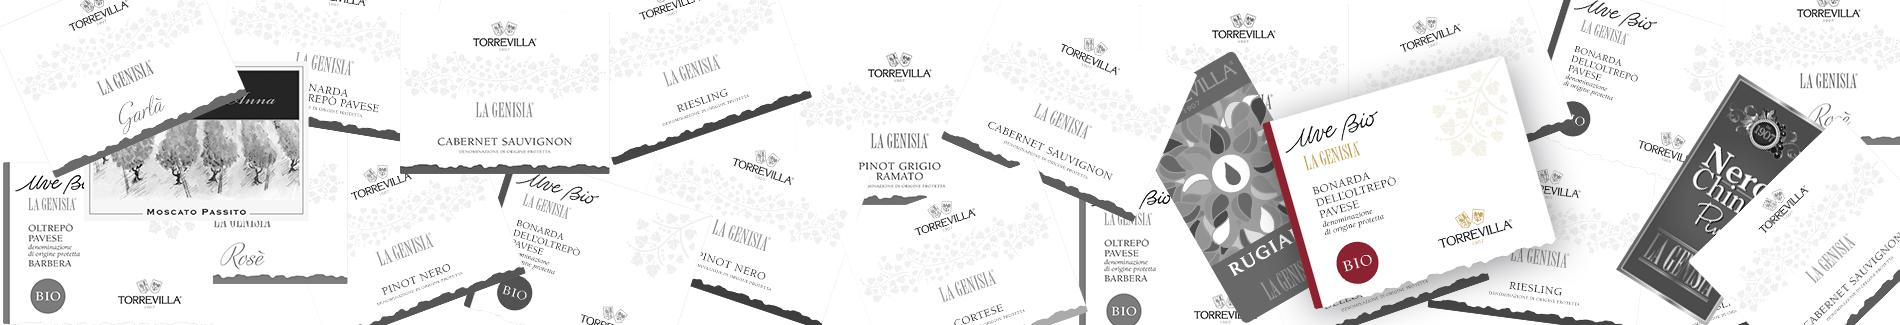 Bonarda dell'Oltrepò Pavese Bio